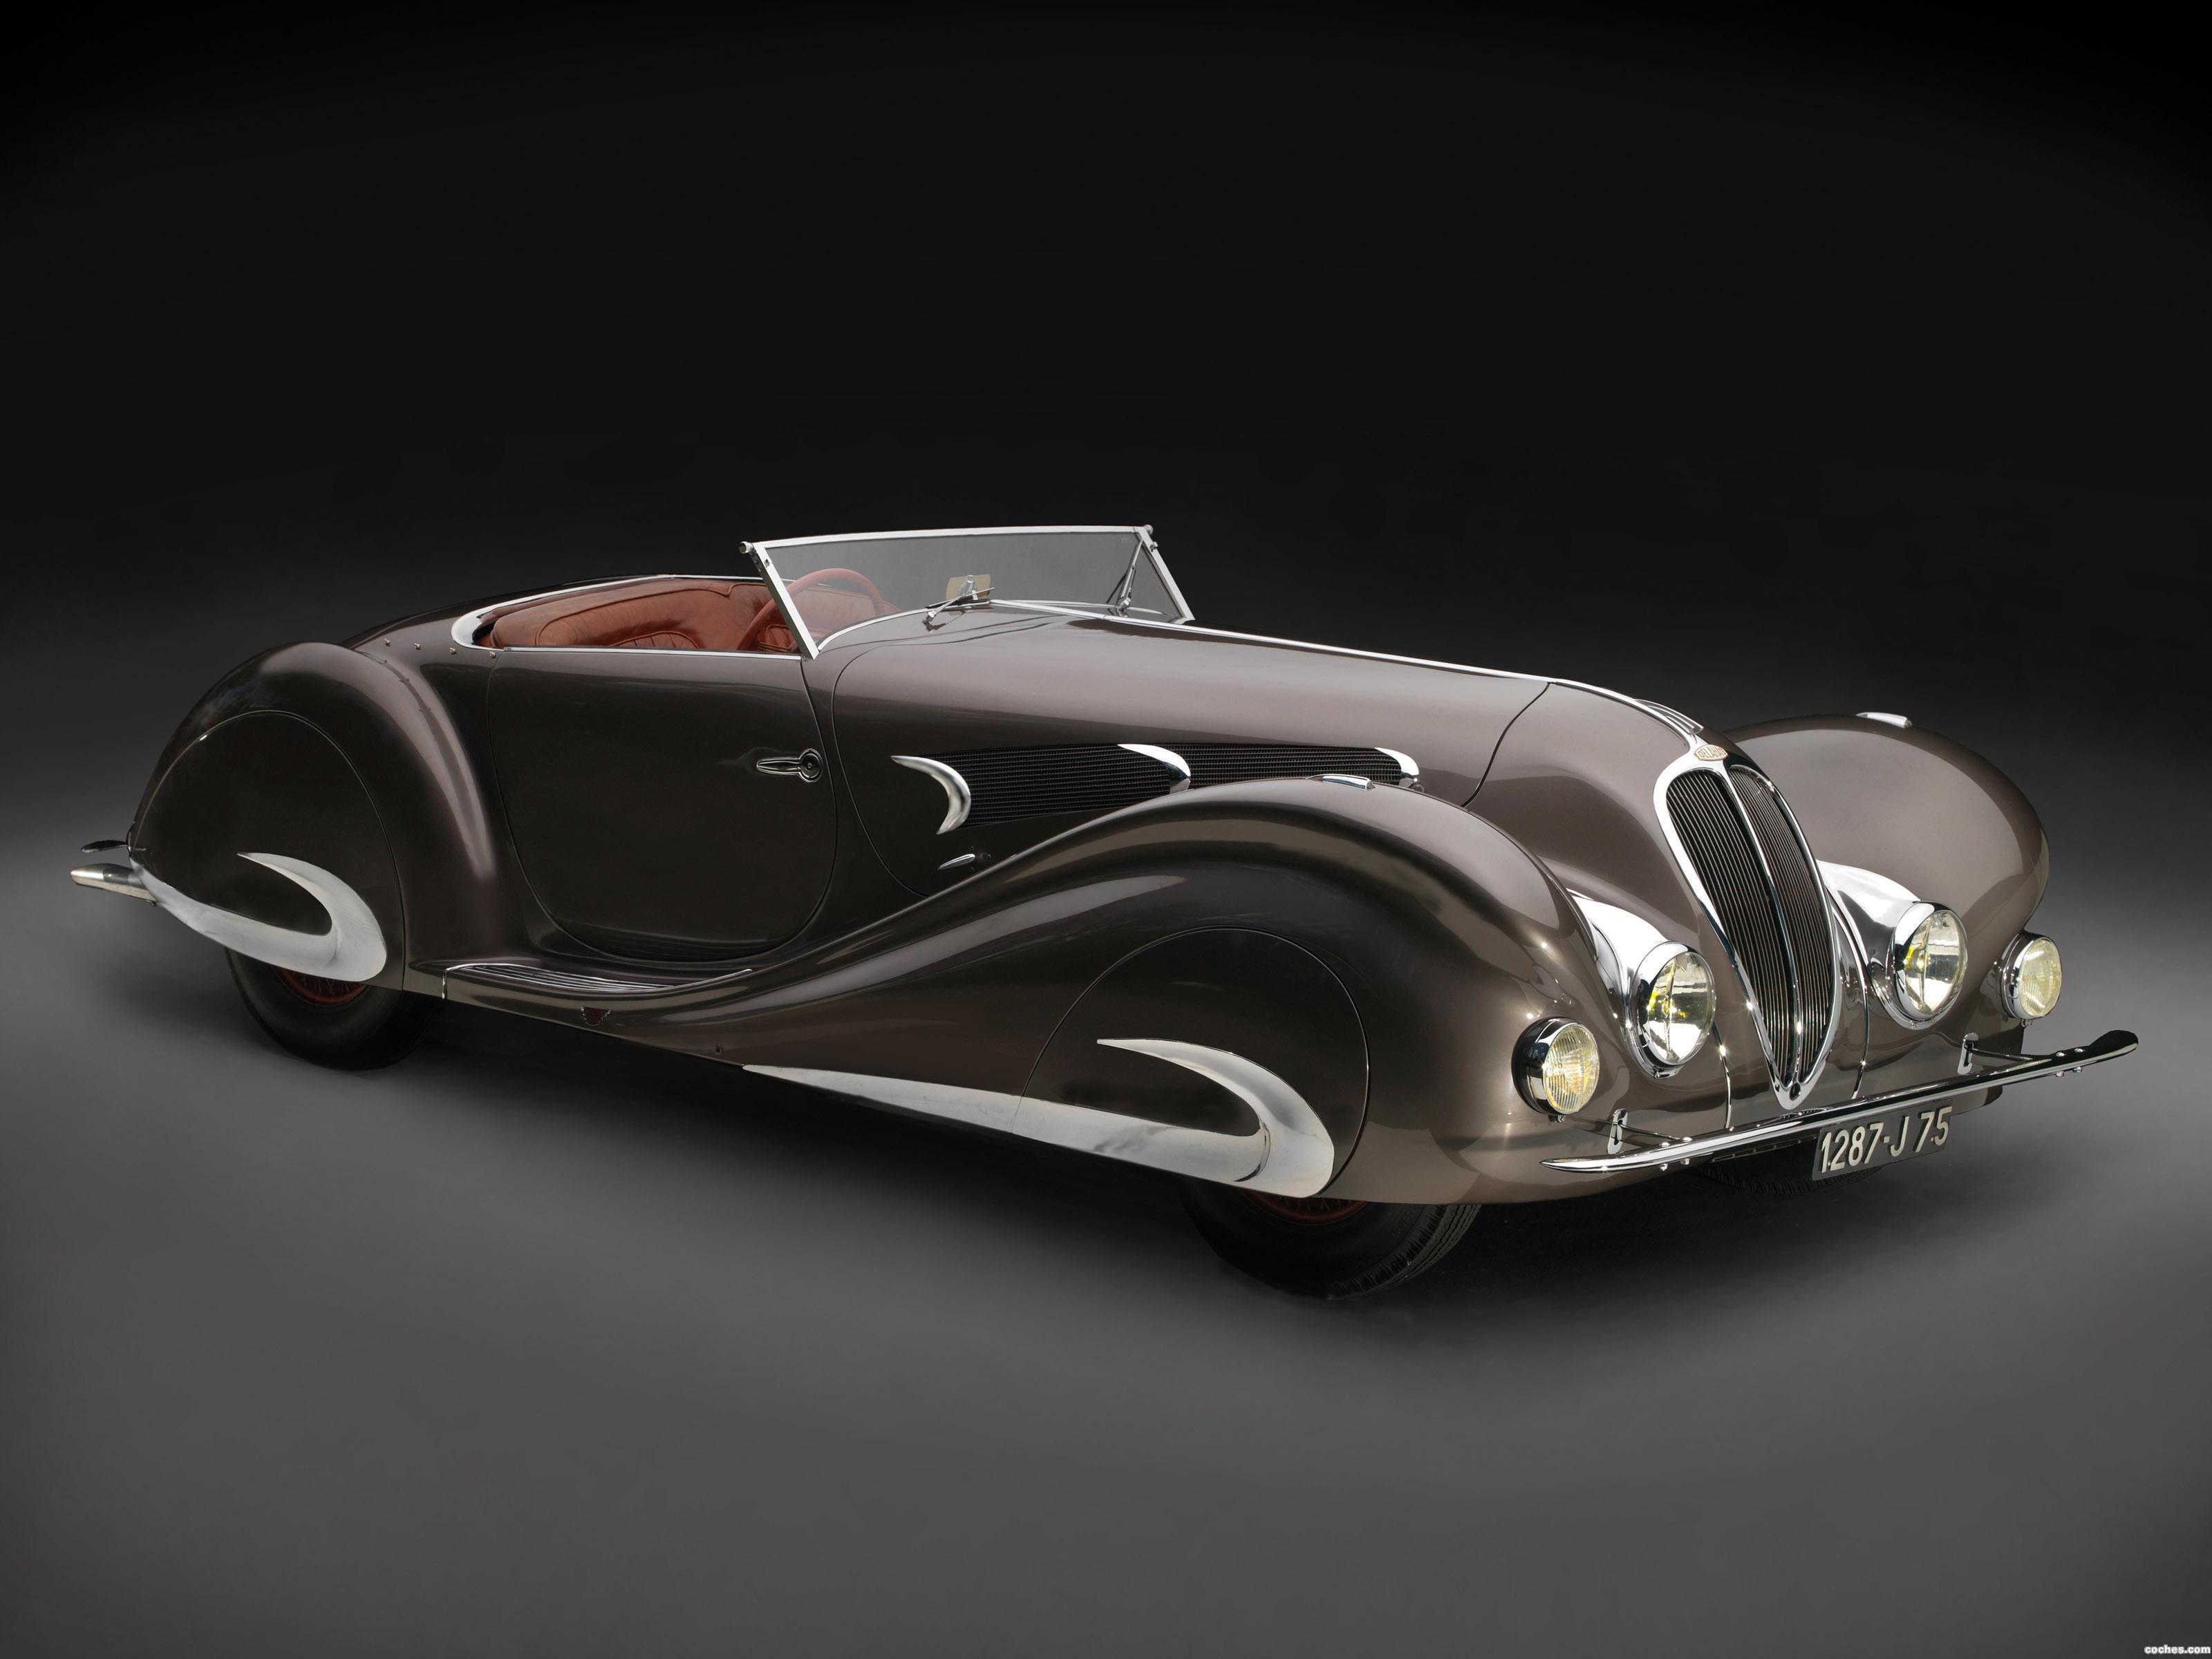 Foto 0 de Delahaye 135 MS Special Roadster by Figoni et Falaschi 1937